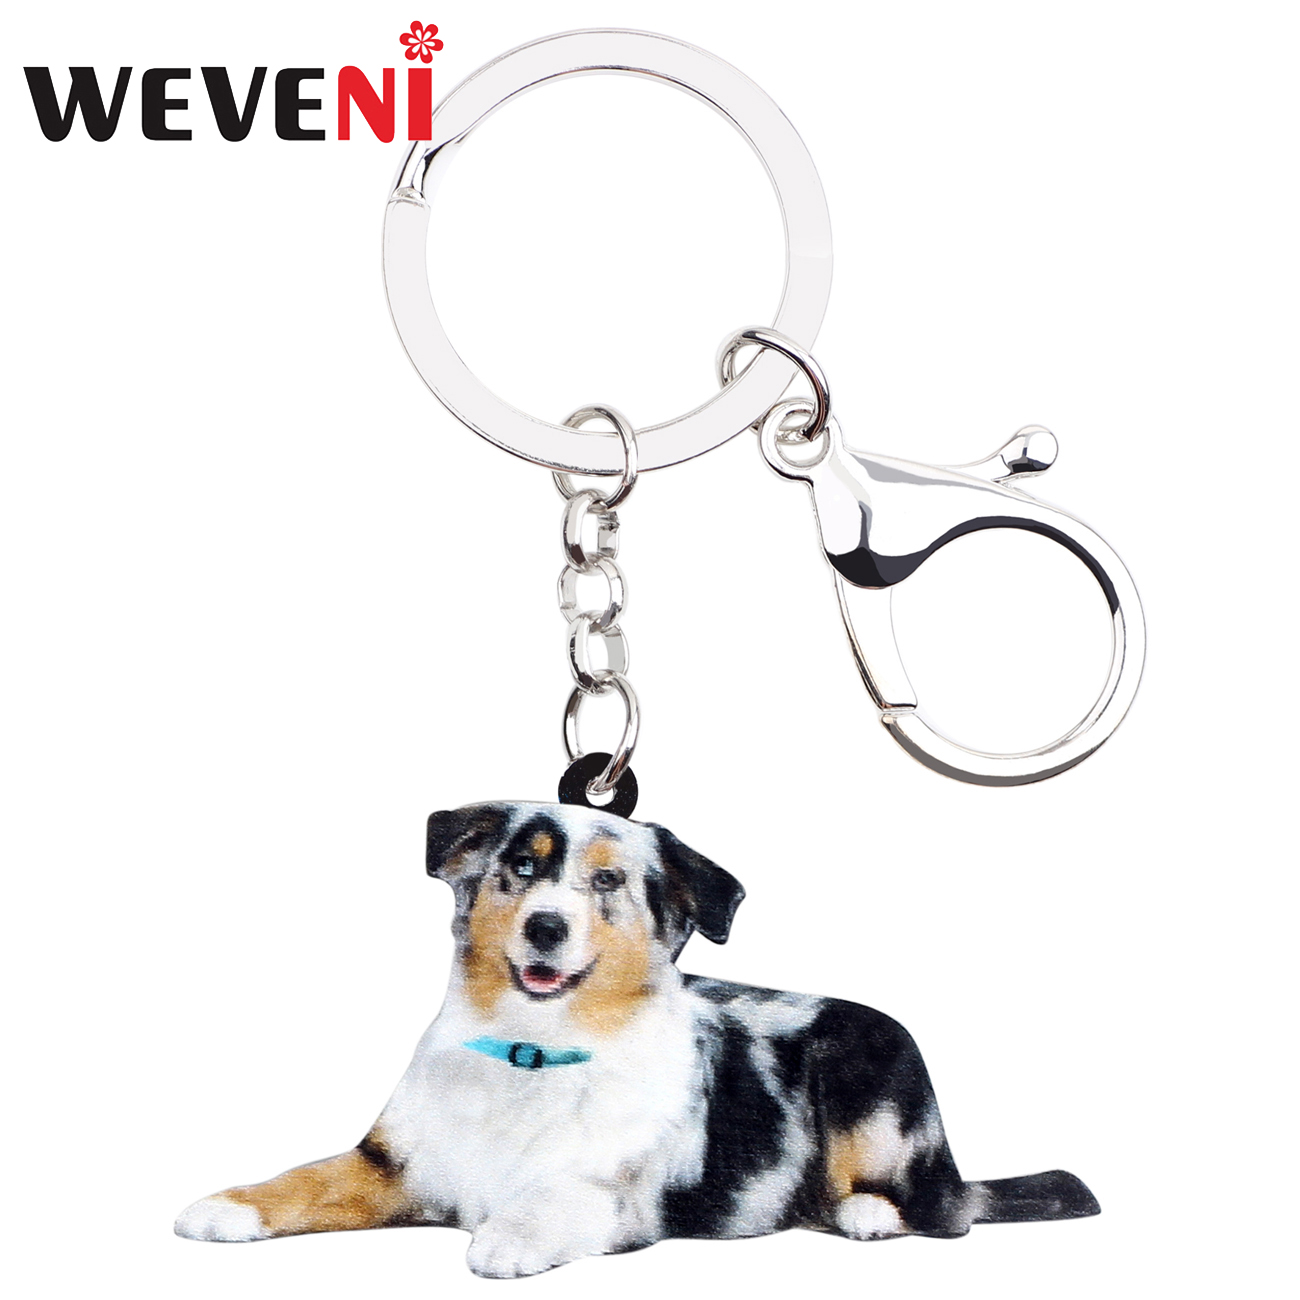 WEVENI Acrylic Australian Shepherd Dog Key Chain Keychain Holder Animal Pet Jewelry For Women Girls Gift Bag Car Charms Pendant